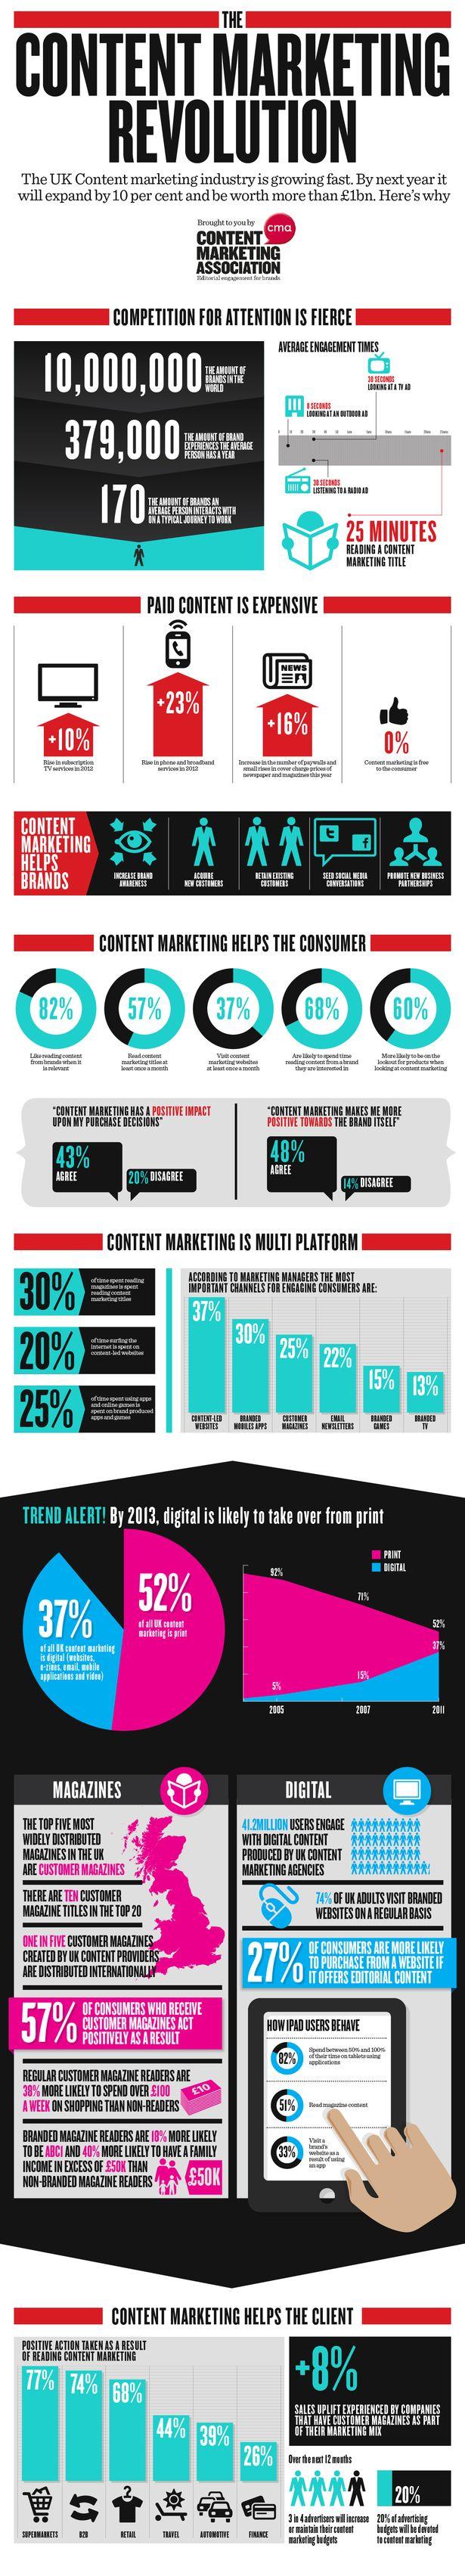 Content marketing infographicContent, Del Marketing, Marketing De, Website, Marketing Revolutions, Social Media, Socialmedia, Content Marketing, Contentmarket Revolutions